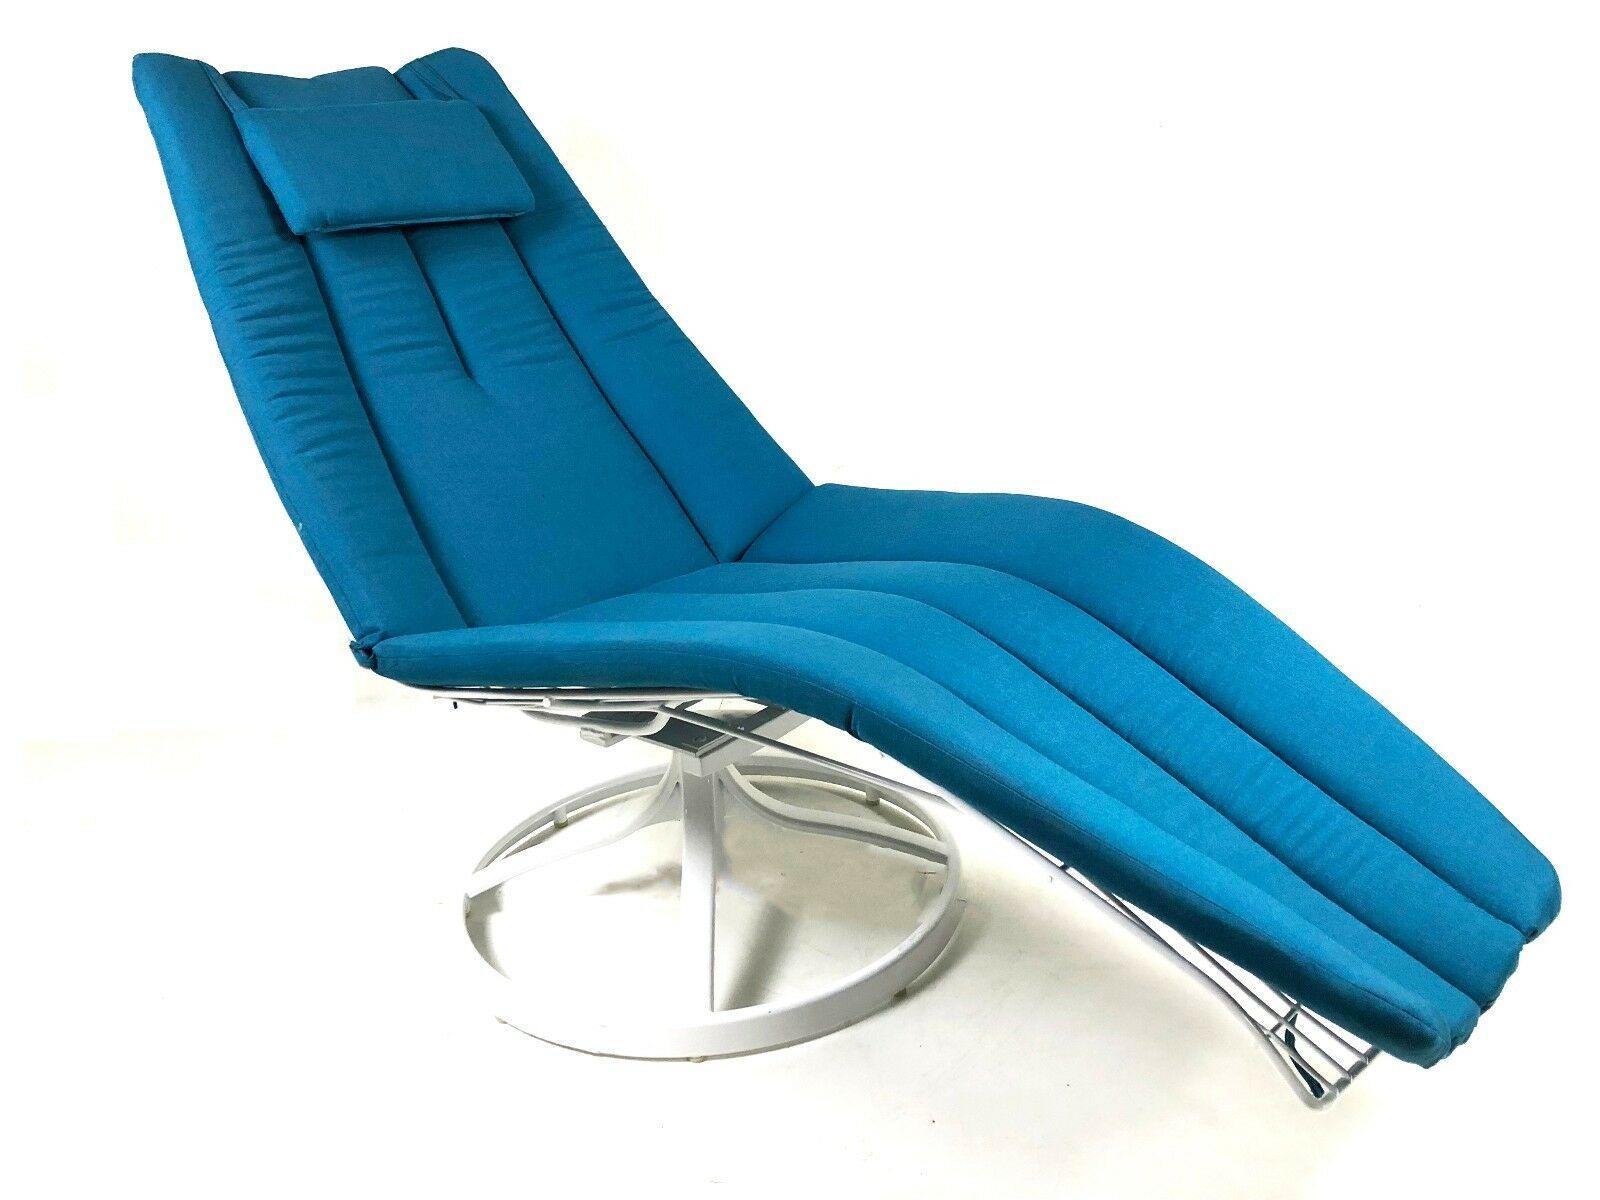 Details About Sunbrella Spectrum Cushions For Homecrest Siesta